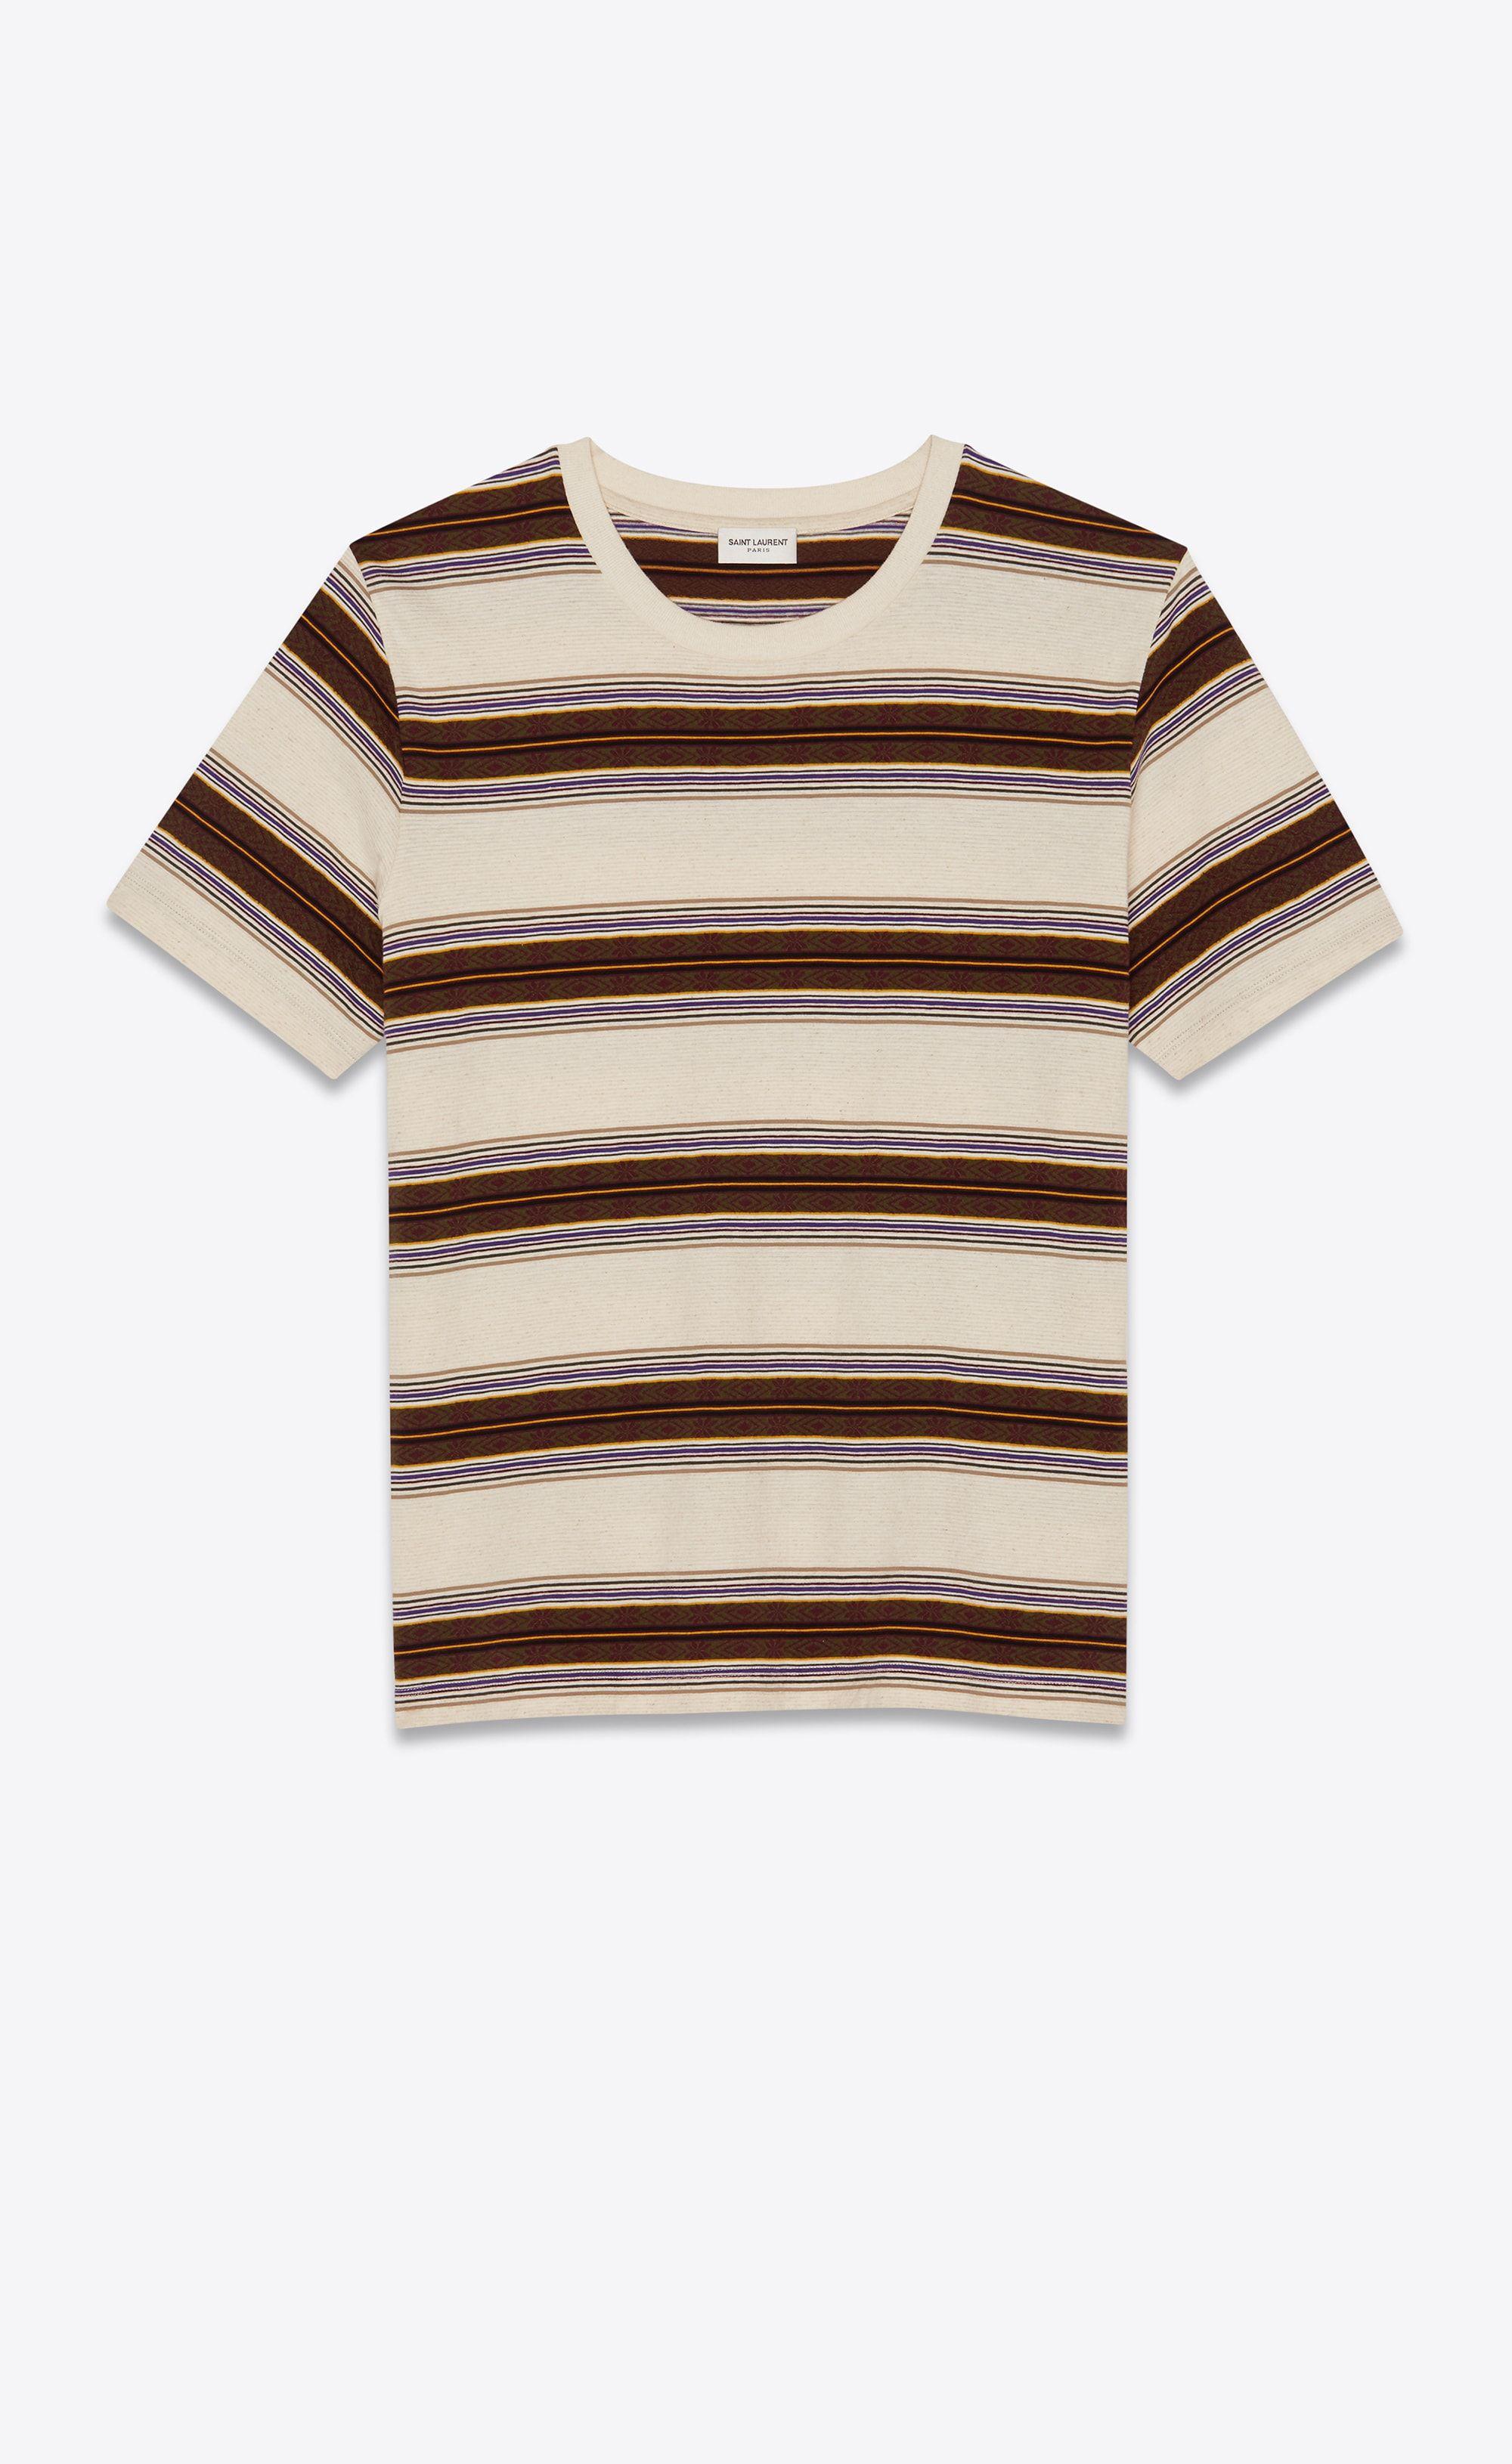 6d7427efc1d Saint Laurent Jacquard Striped t Shirt   YSL.com   Closet in ...